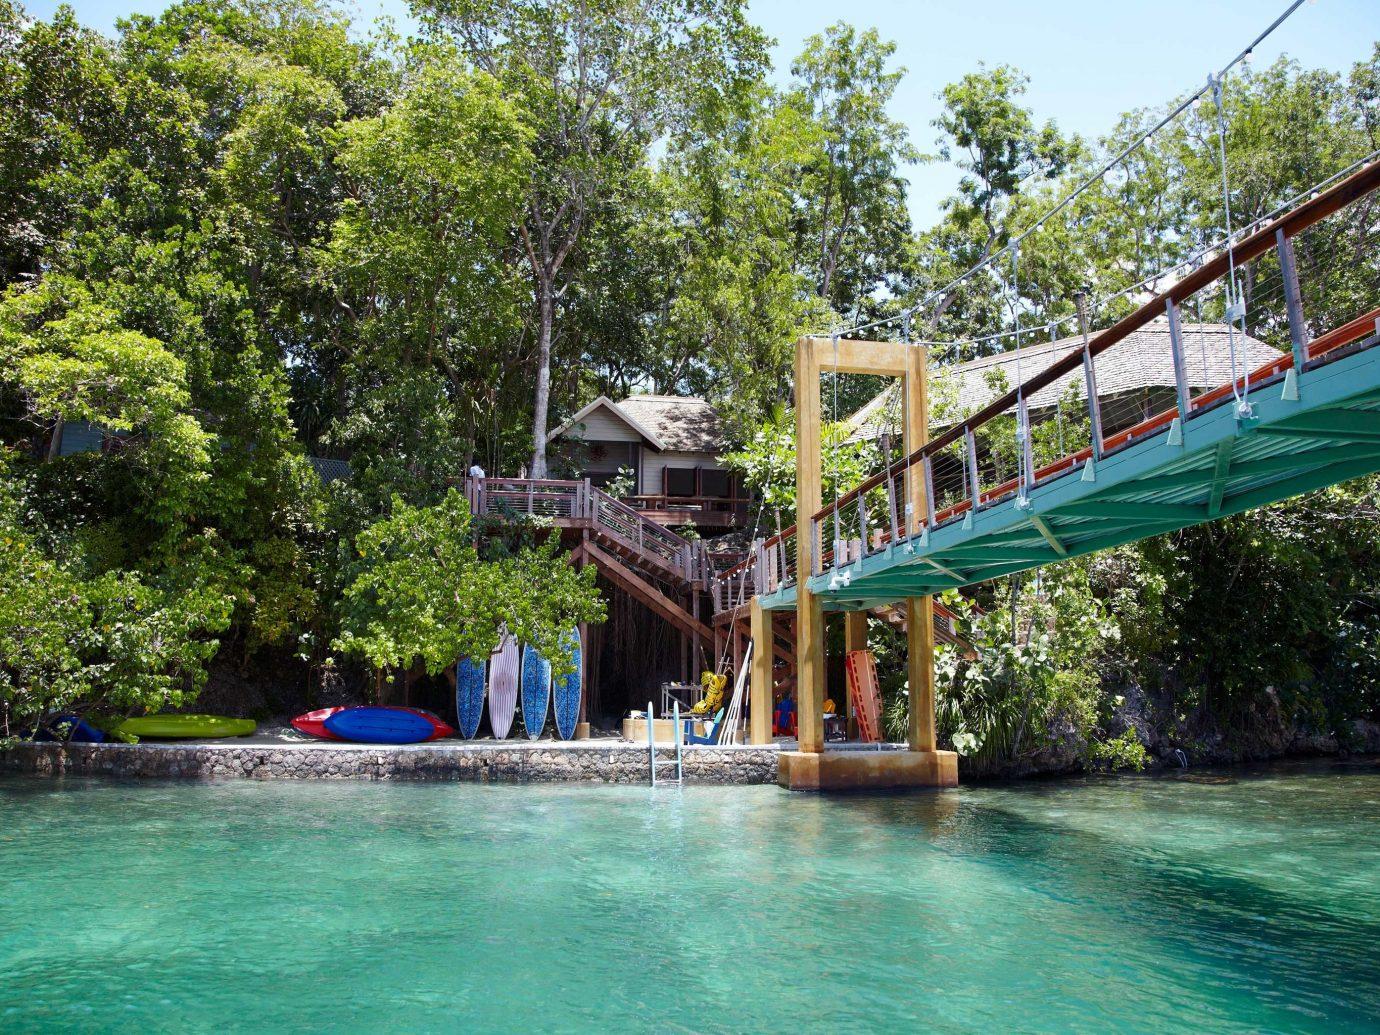 pool at GoldenEye, Jamaica